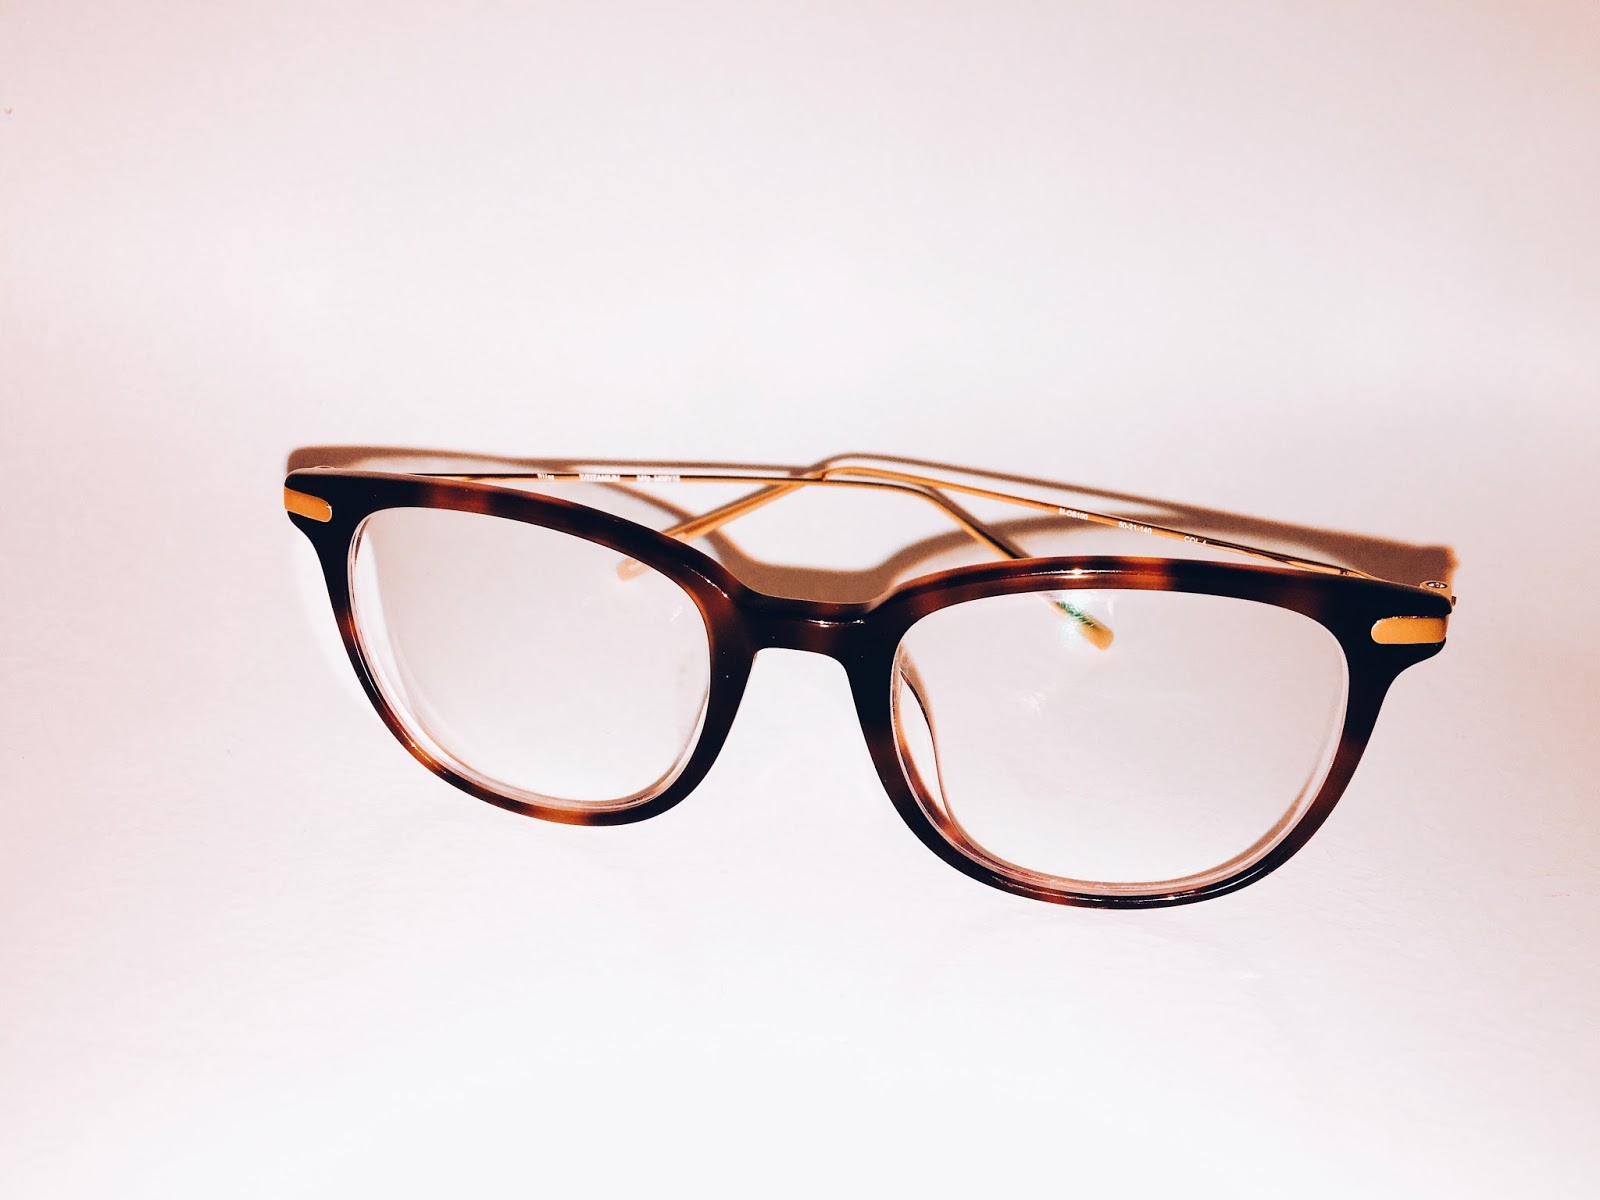 paper pastries: New Glasses! GlassesShop.Com Review